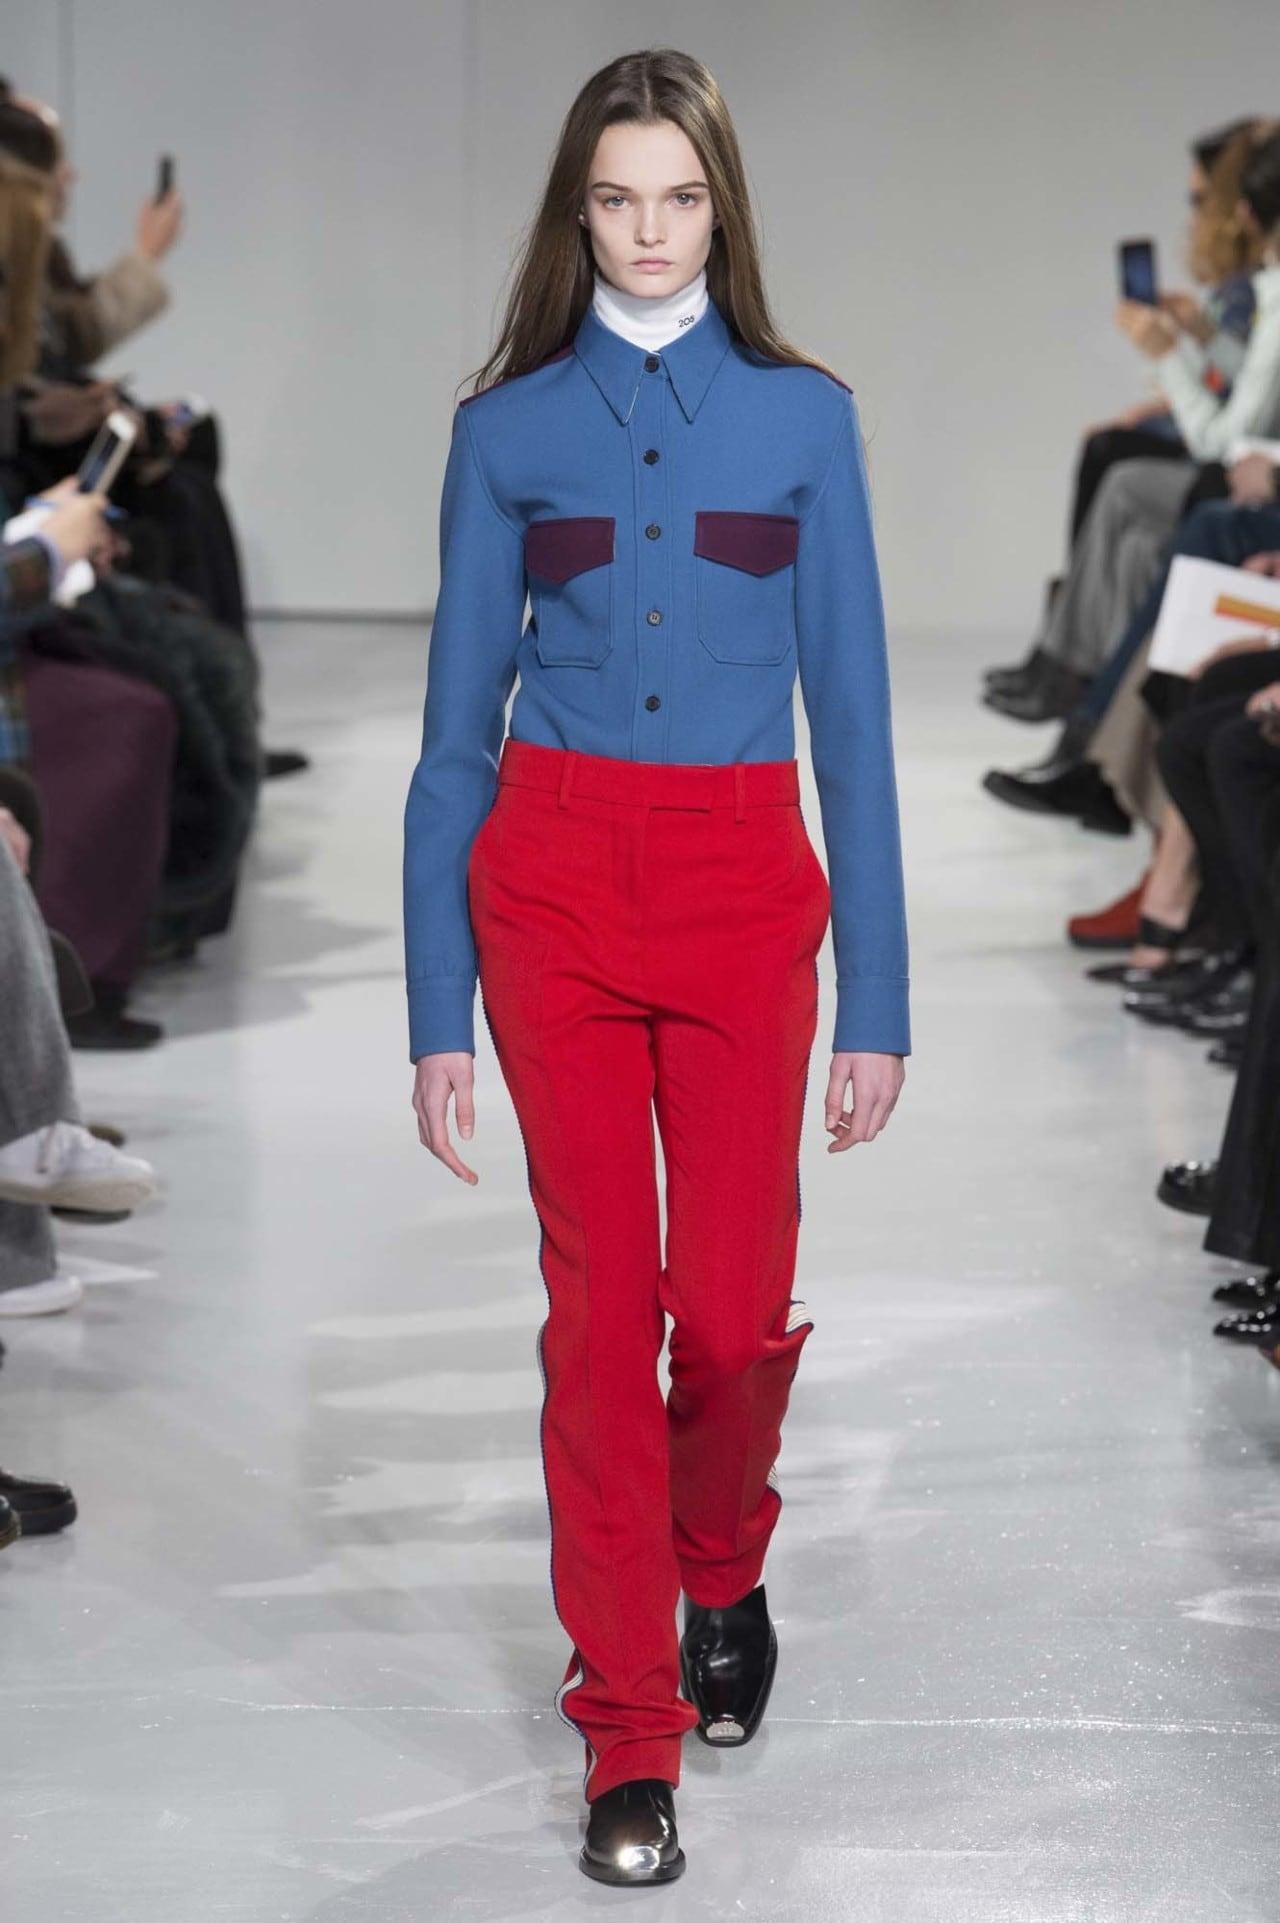 Calvin Klein Collection ready-to-wear autumn/winter '17/'18